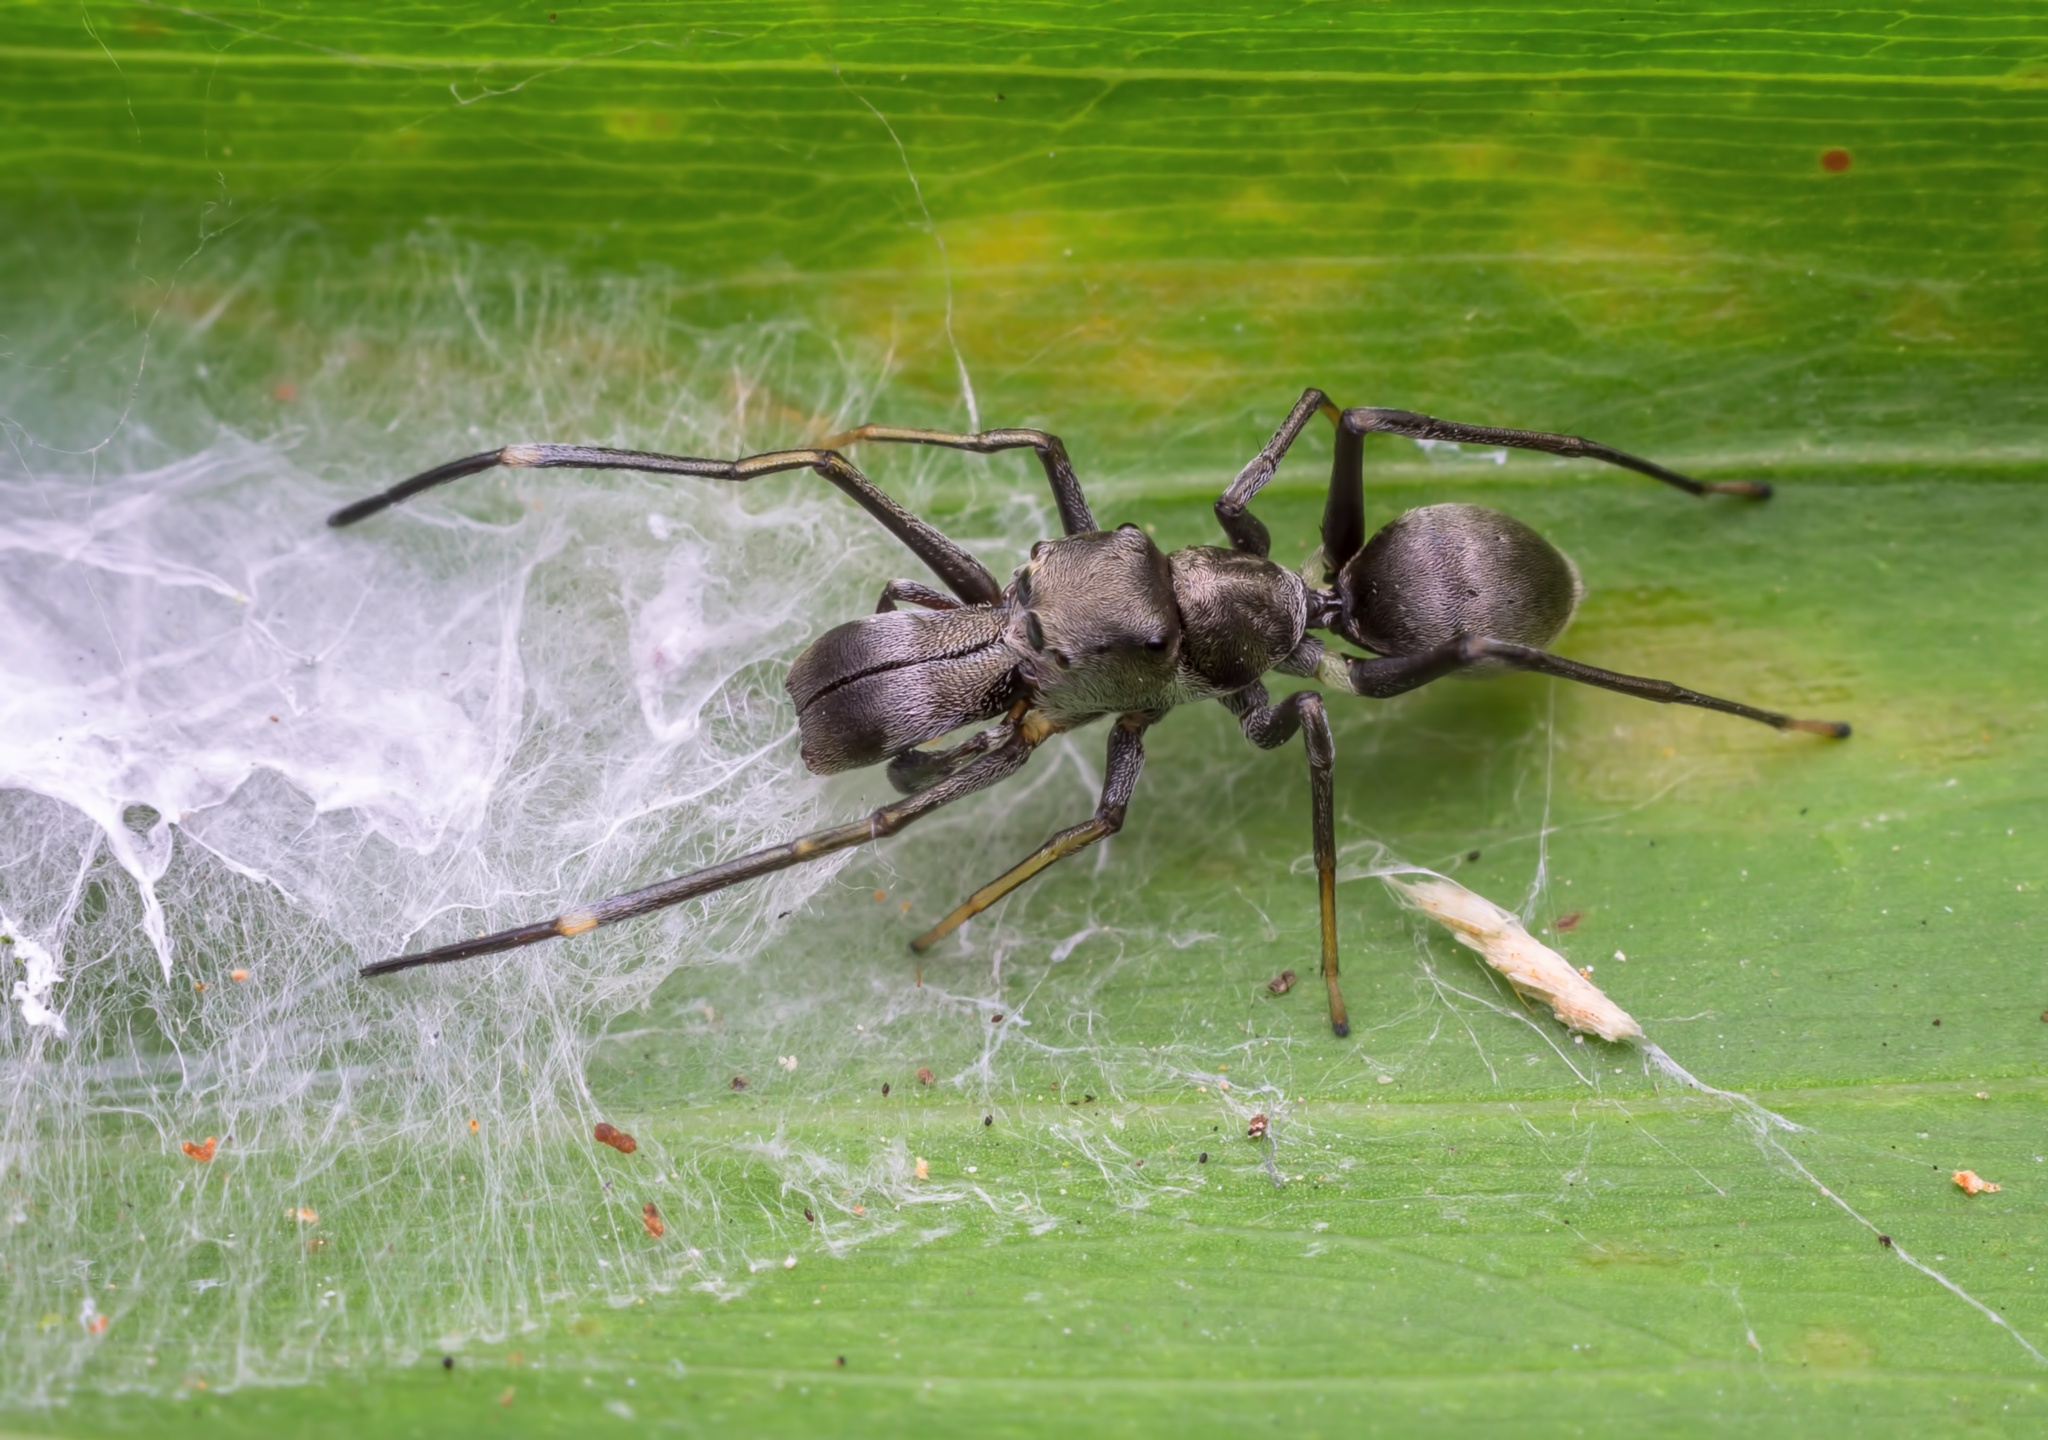 ant mimic king in the house. by injitinjitsemut3